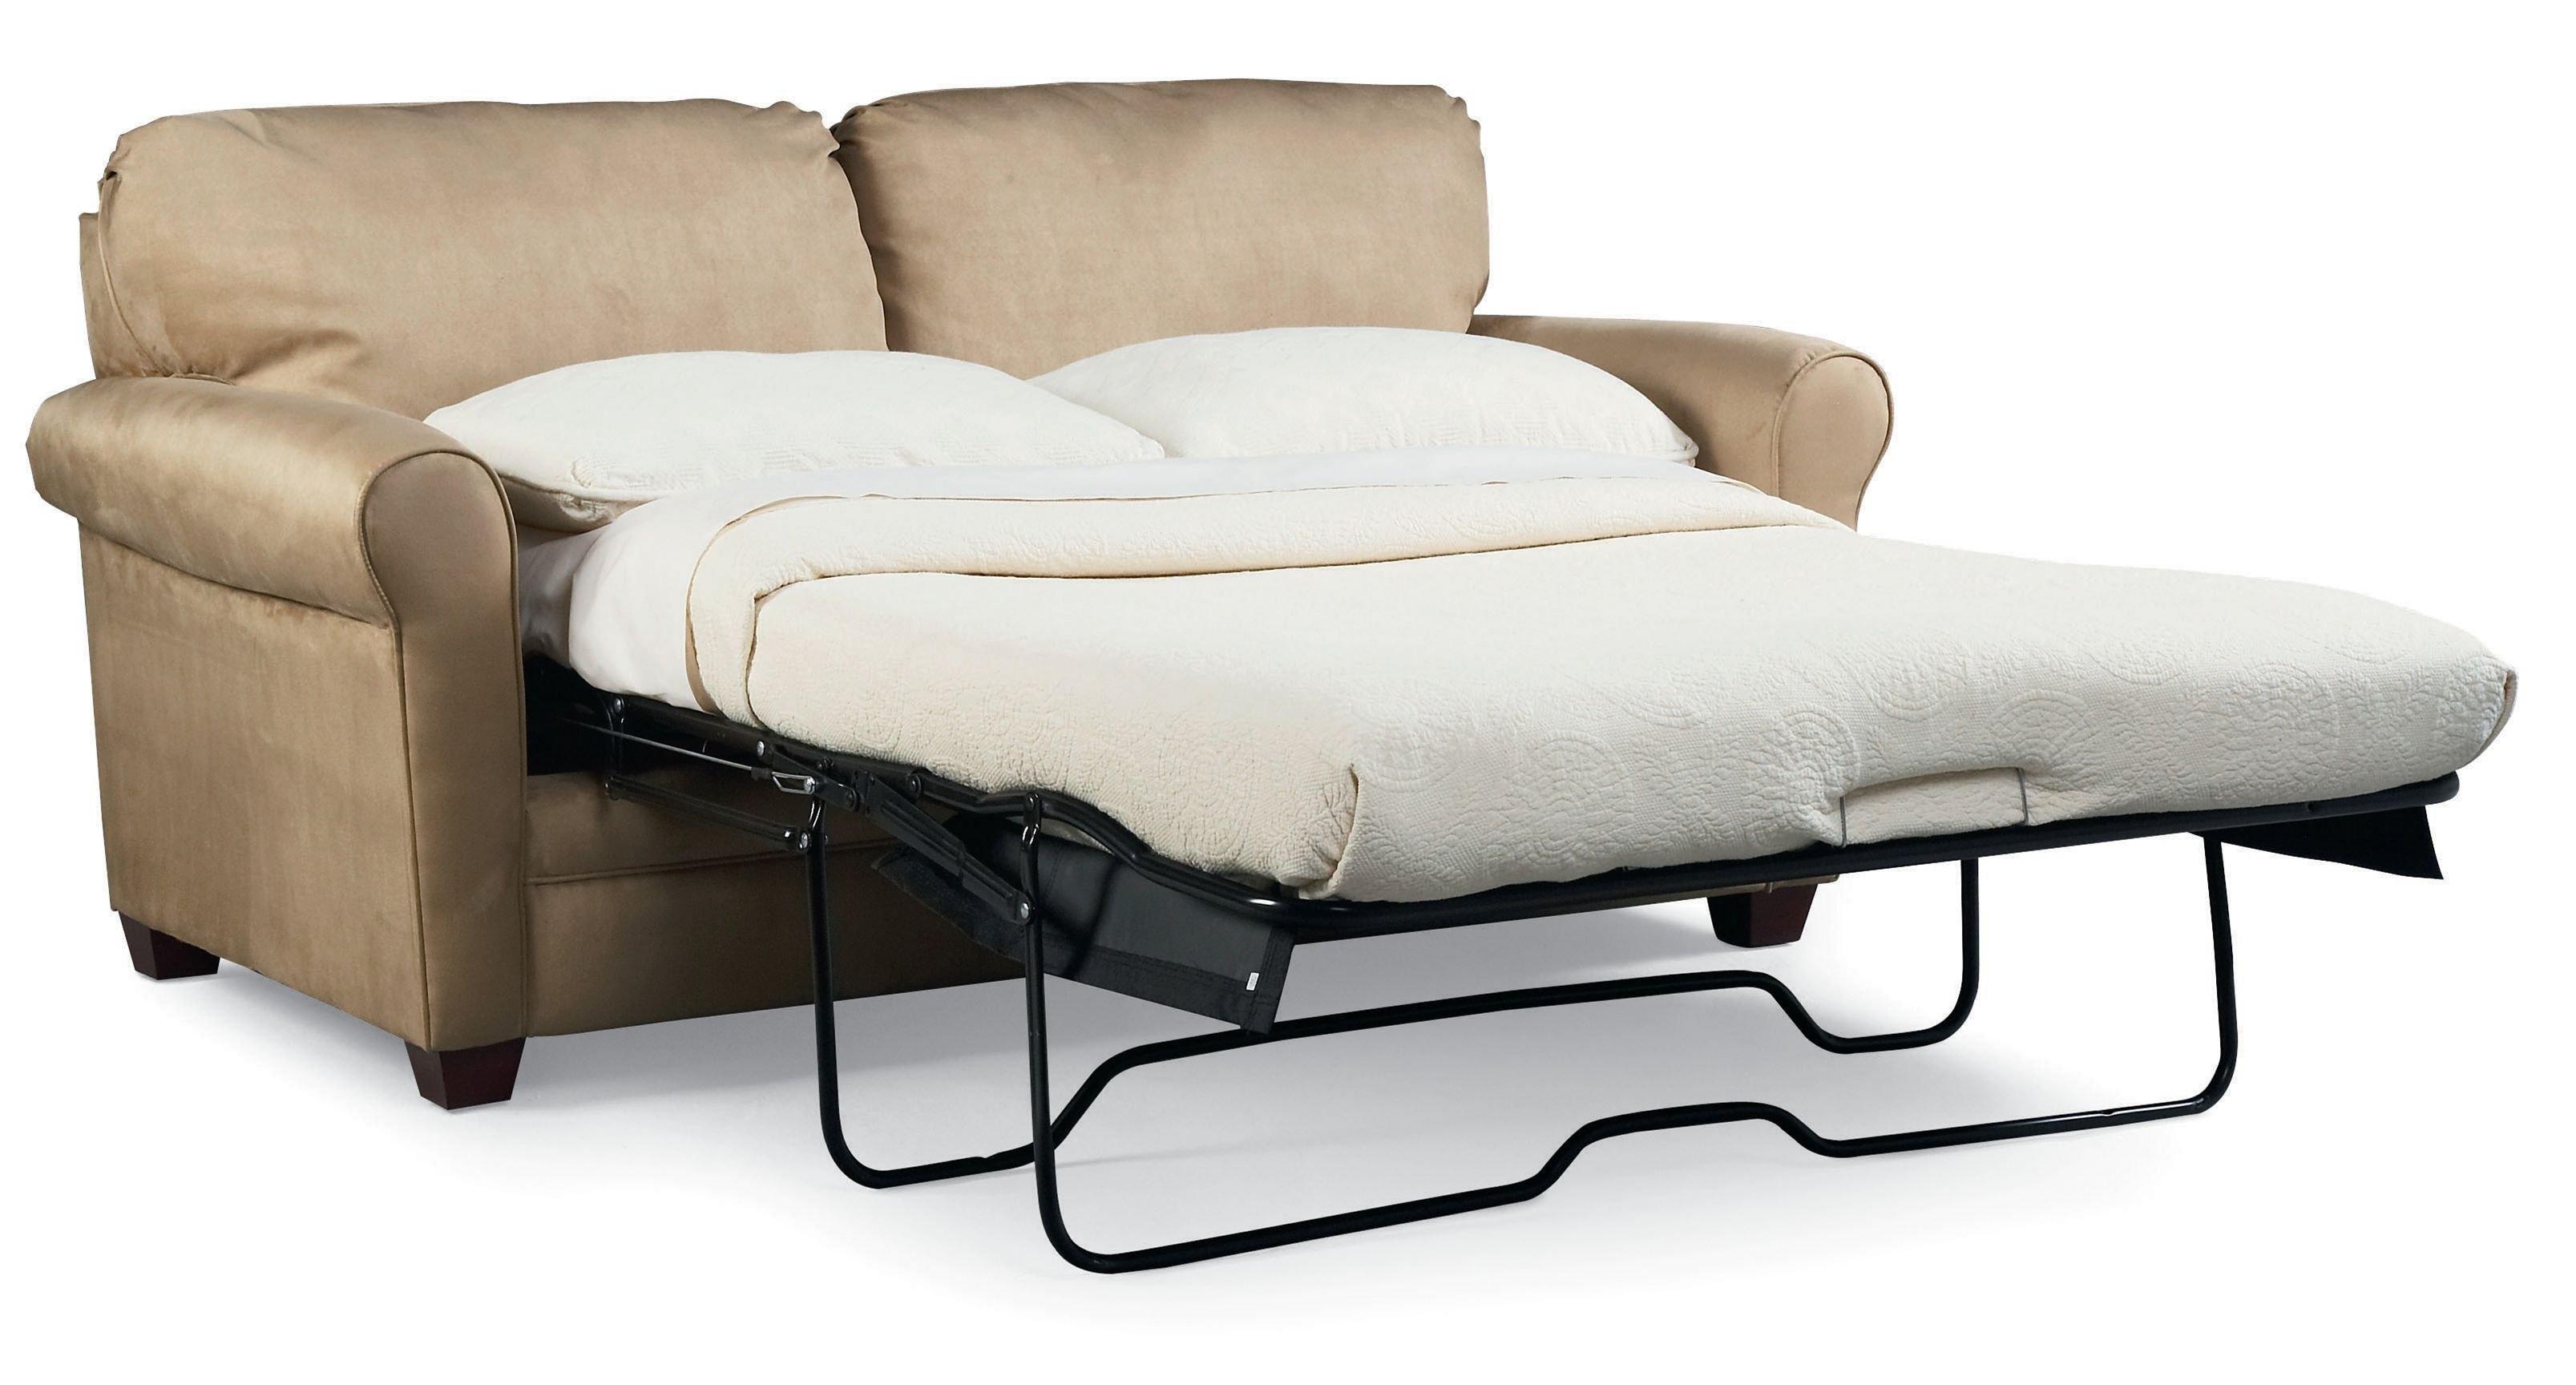 Sofas Center : Sleeper Sofa Mattress Pad Cover Queen Intended For Sleeper Sofas Mattress Covers (View 14 of 20)